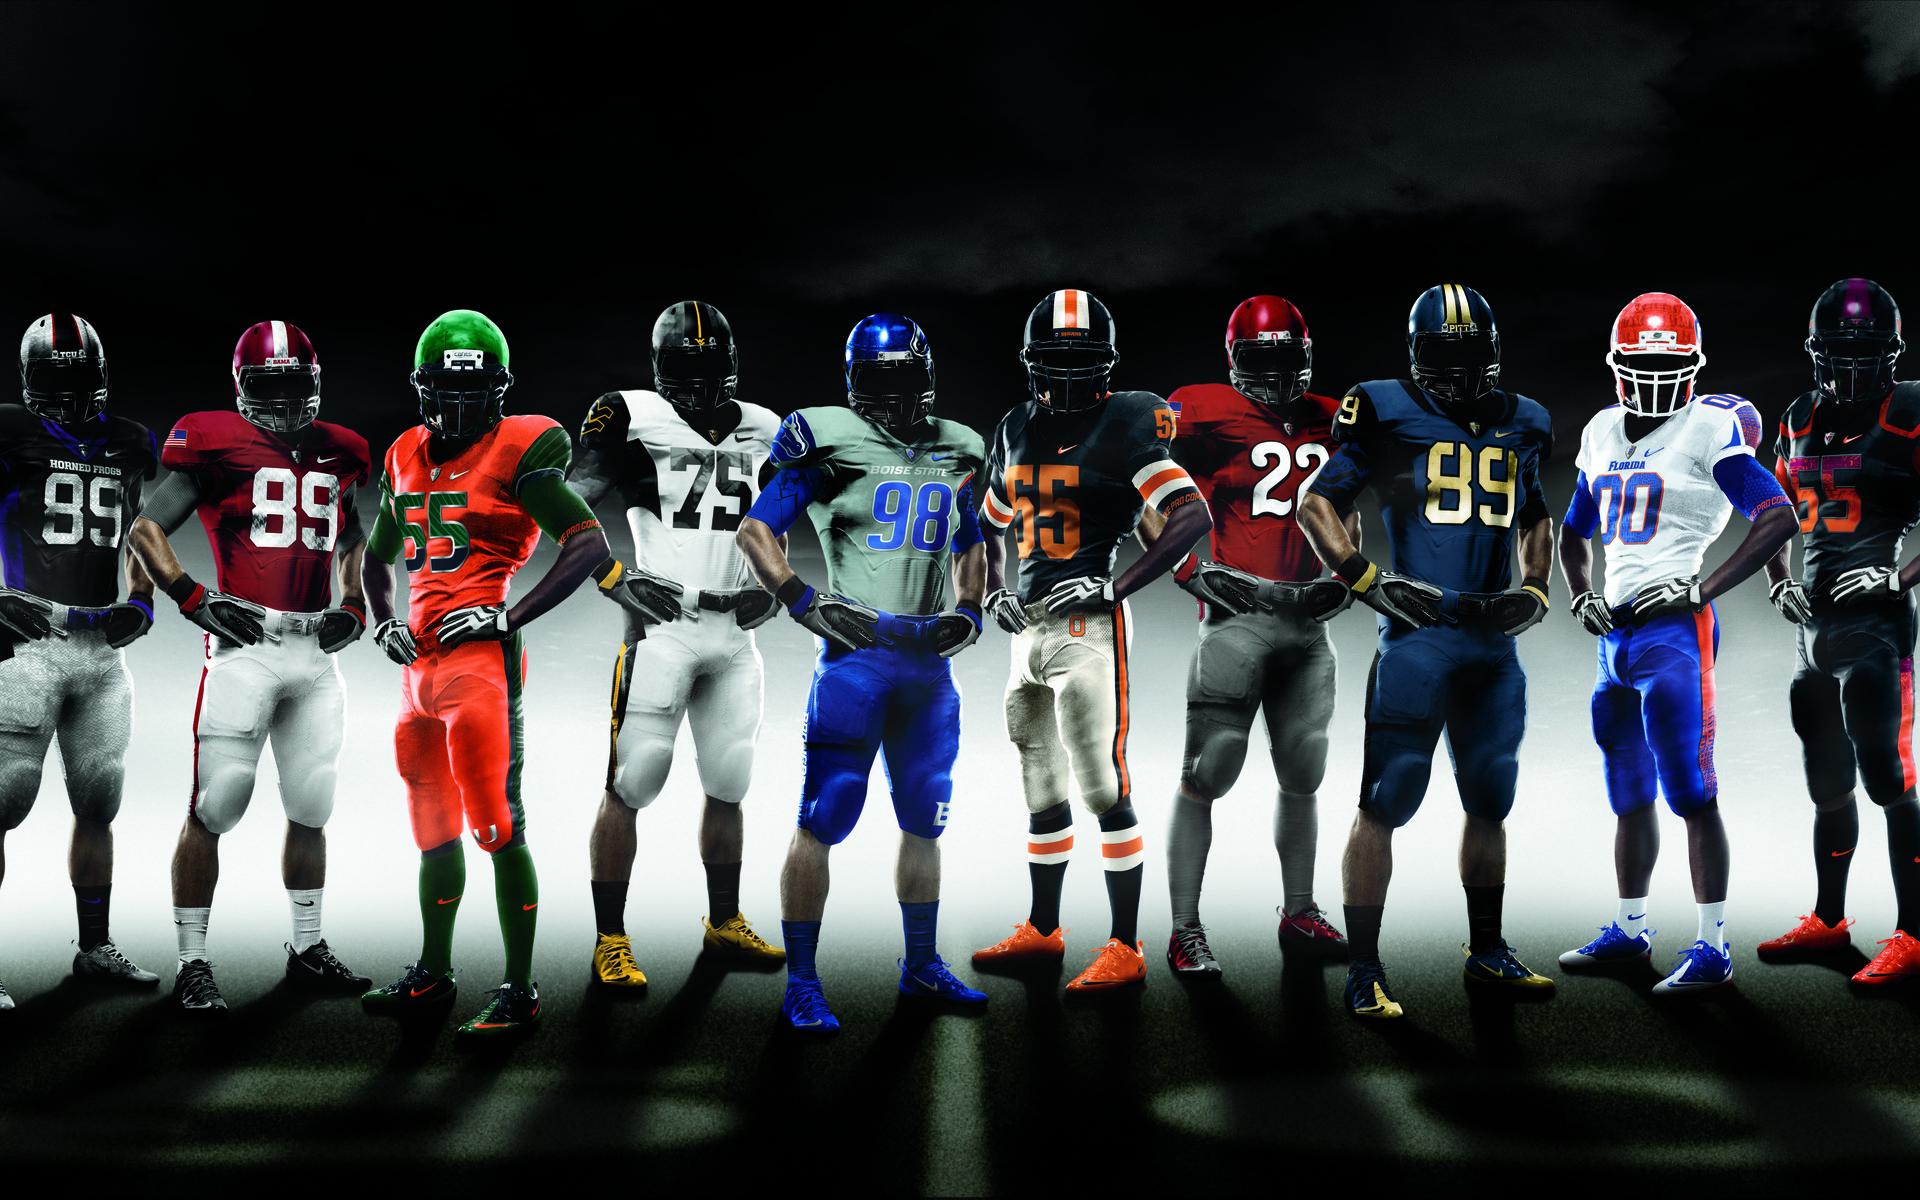 College Football Wallpaper NCAA Nike Pro combat in 2010 HD 1920x1200